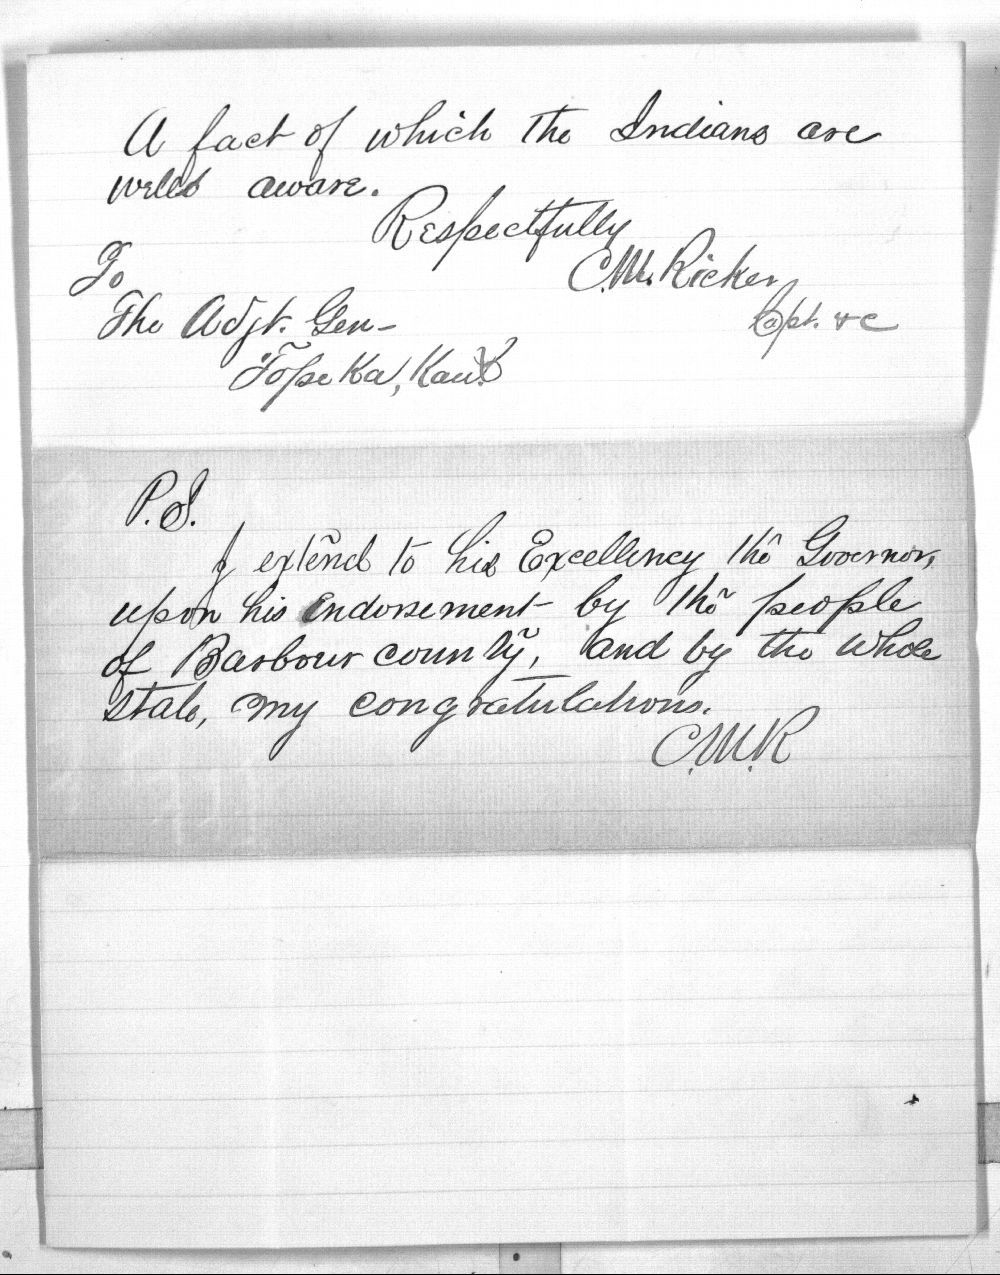 C. M. Ricker to Charles Morris - 2